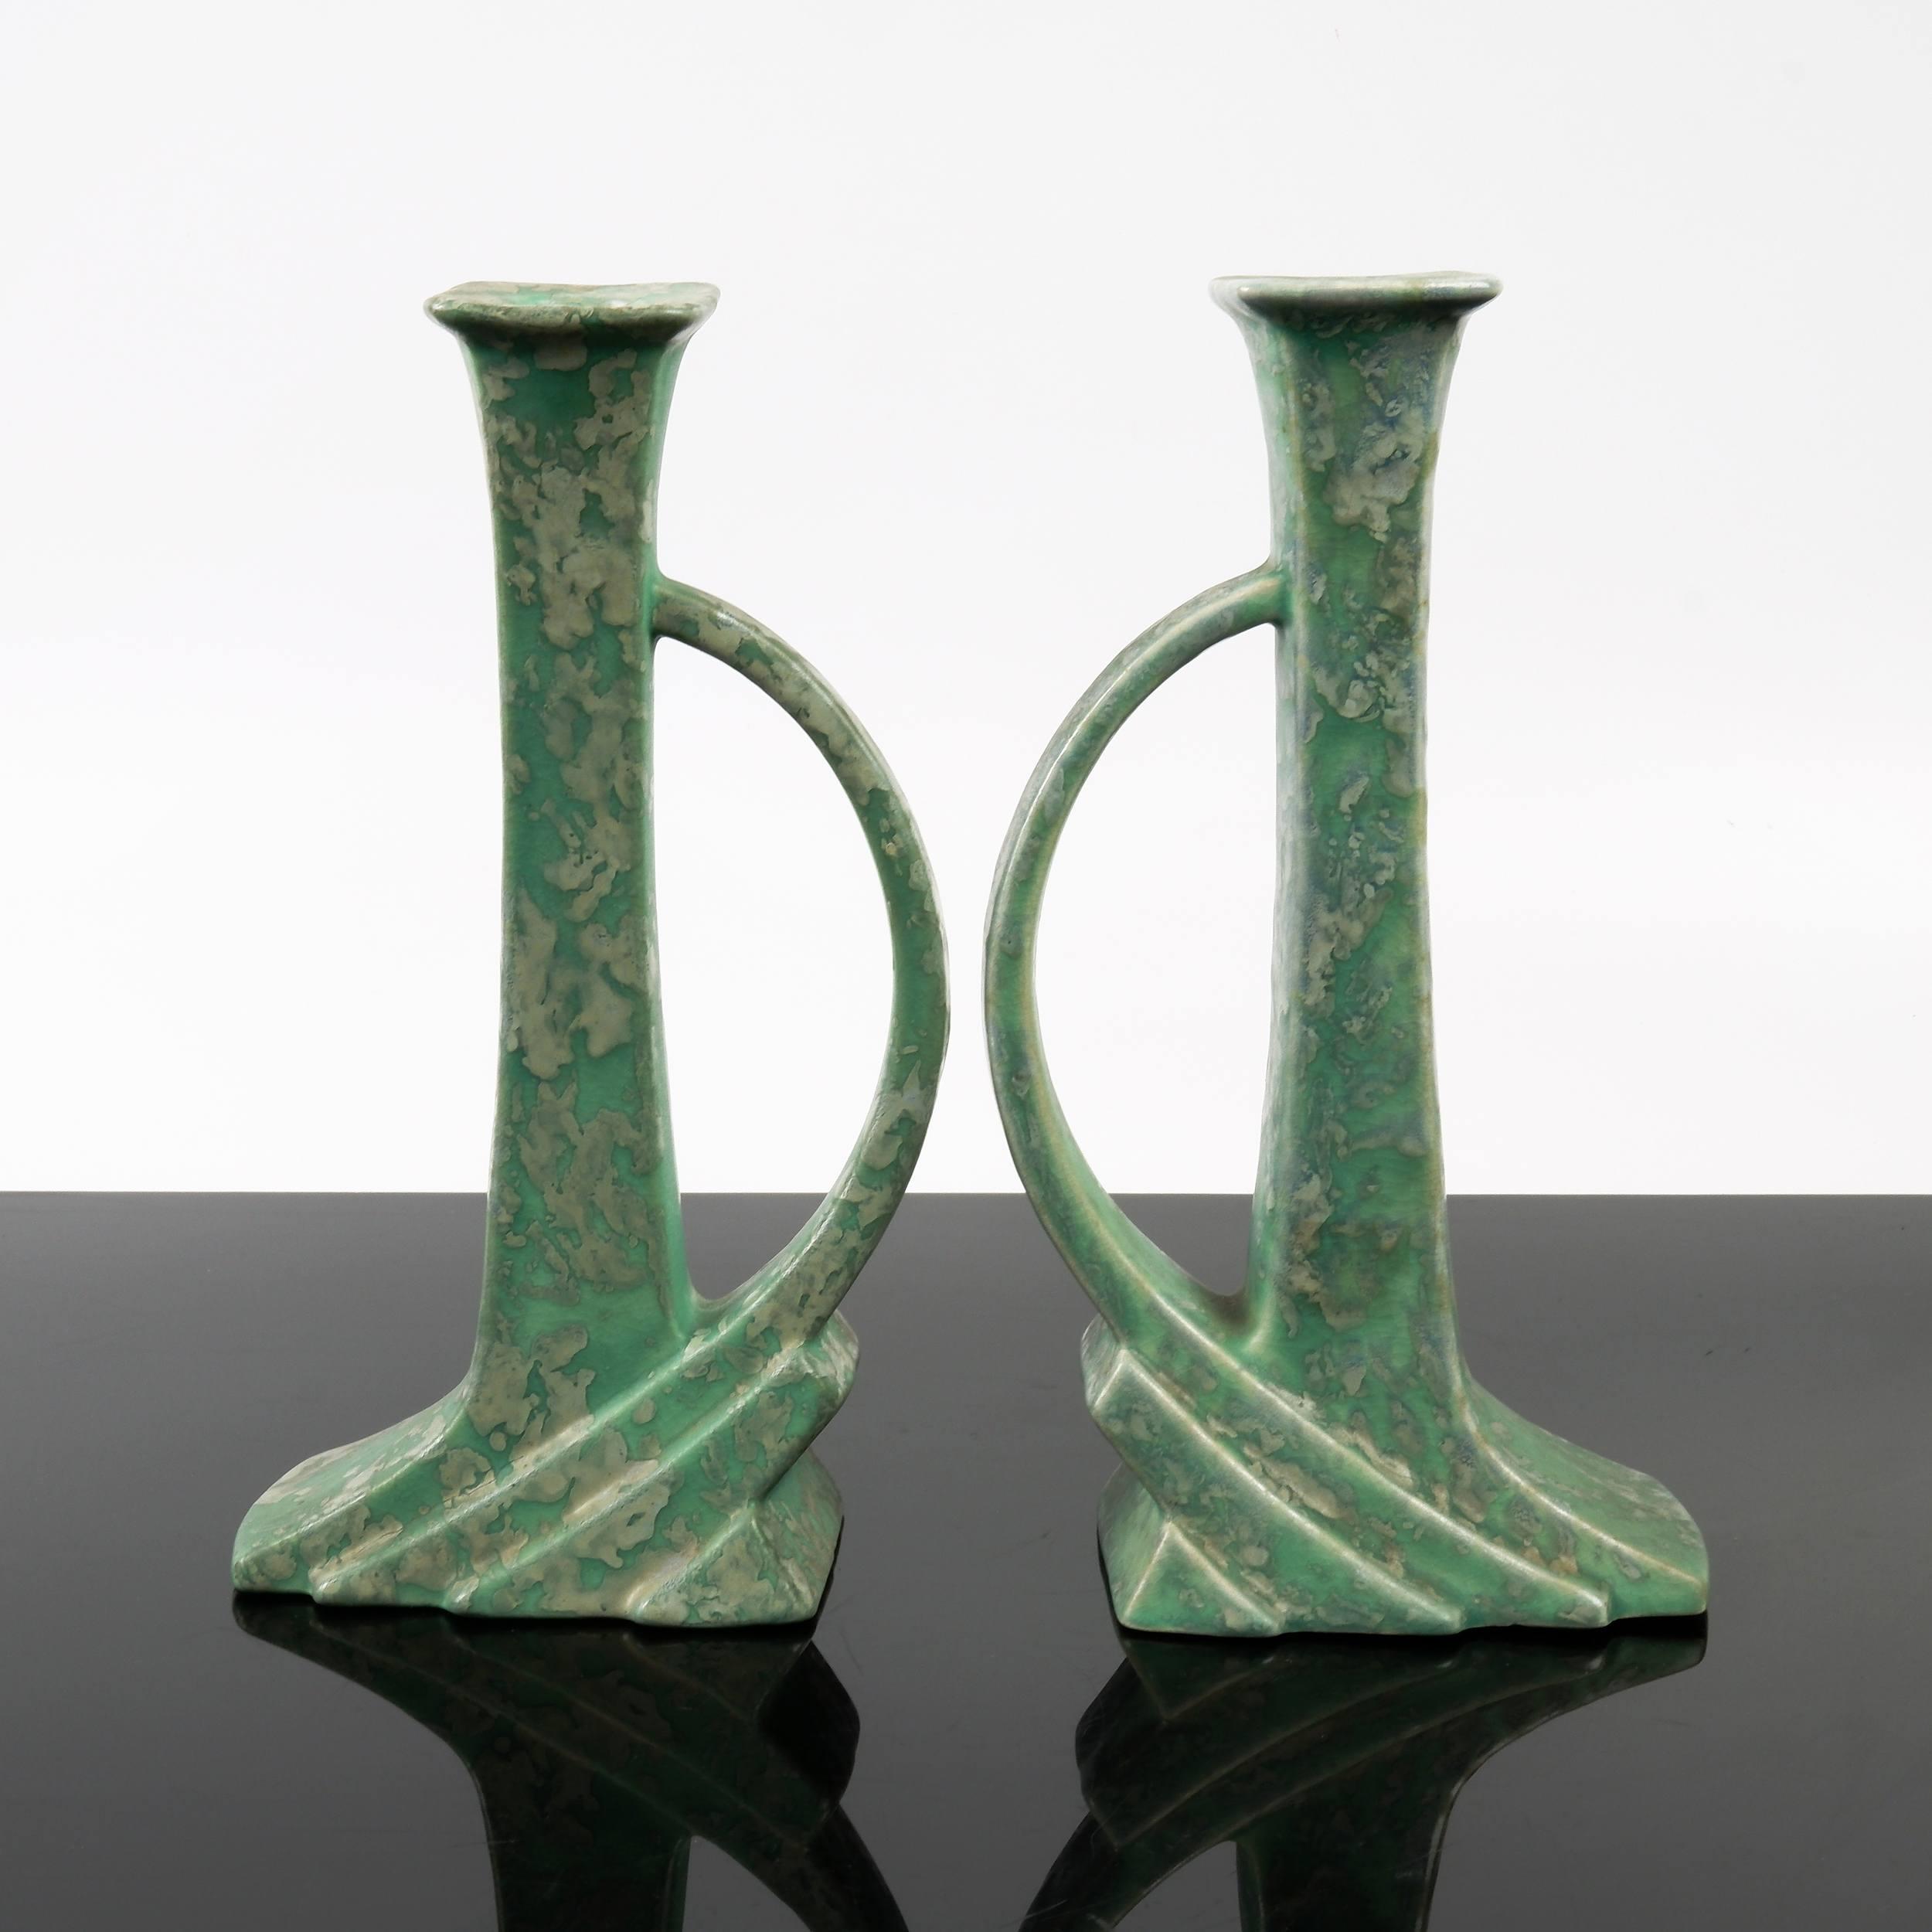 'Pair of Art Deco Green Salt Glazed Ceramic Candlesticks, Probably Pierrefonds'